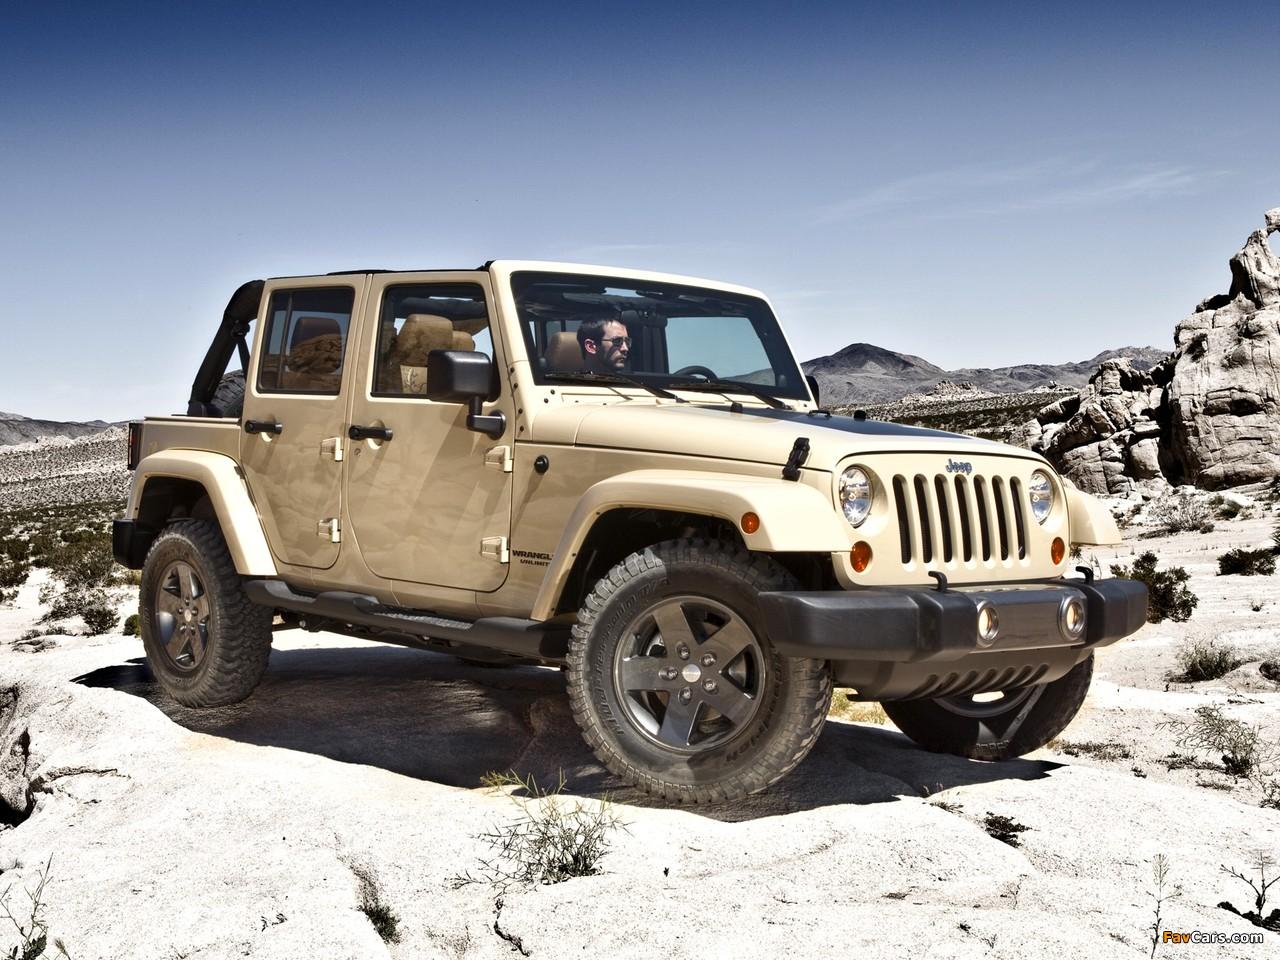 Jeep Wrangler Unlimited Mojave (JK) 2011 photos (1280 x 960)